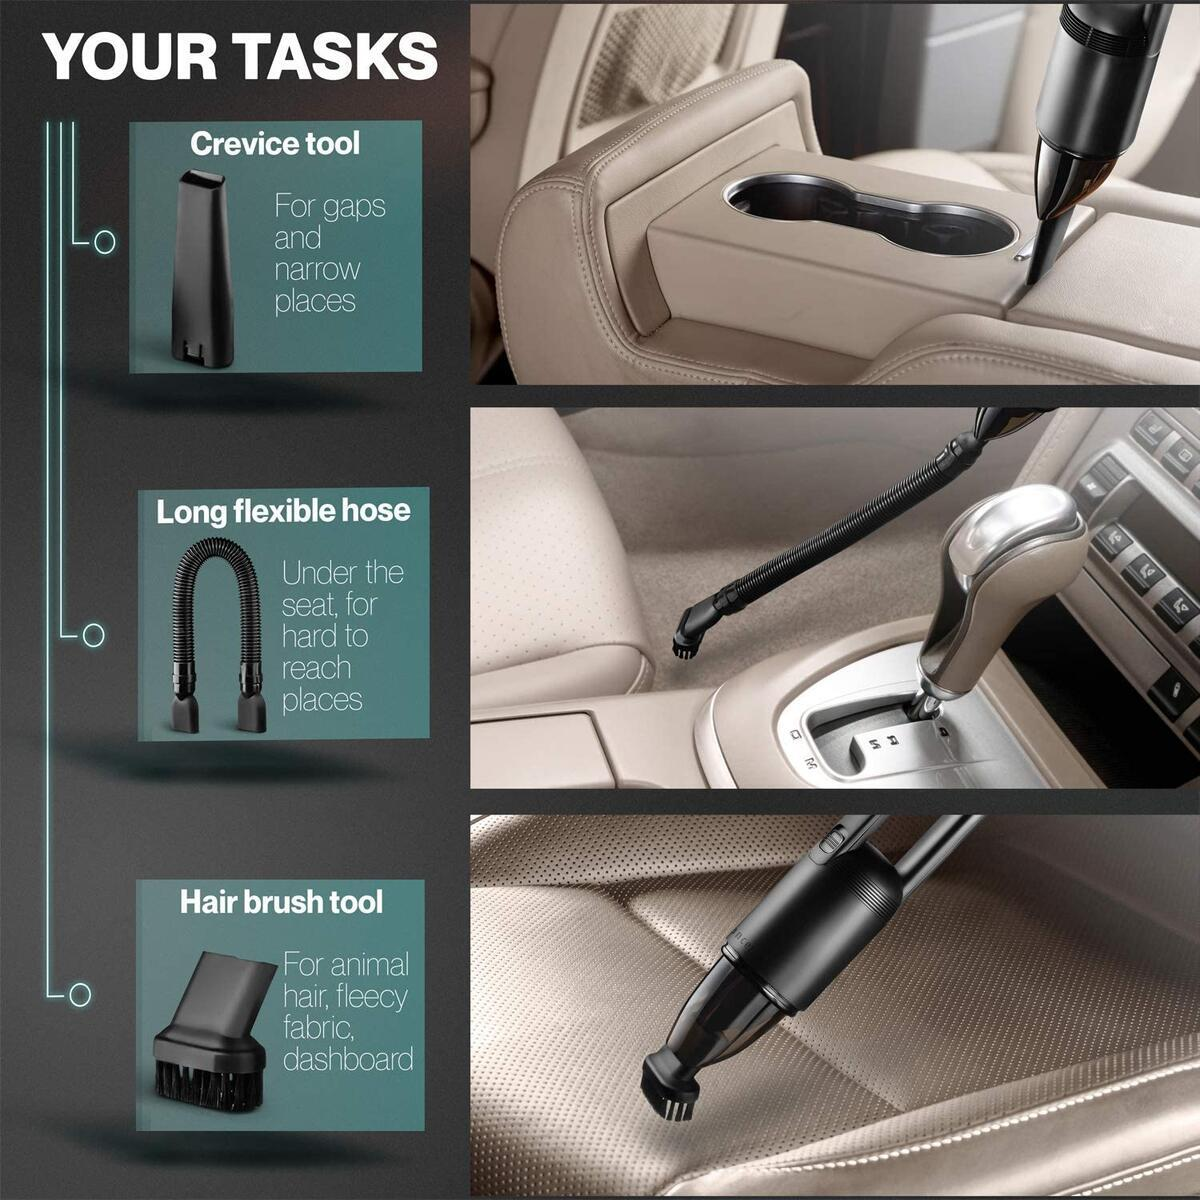 Neancer Handheld Vacuum, Handheld Car Vacuum Cleaner, Corded – Portable Mini Hand Vacuum for Cleaning Interior of Car, Truck, SUV, Van, RV – Automotive Vacuum with Powerful Suction Plugs